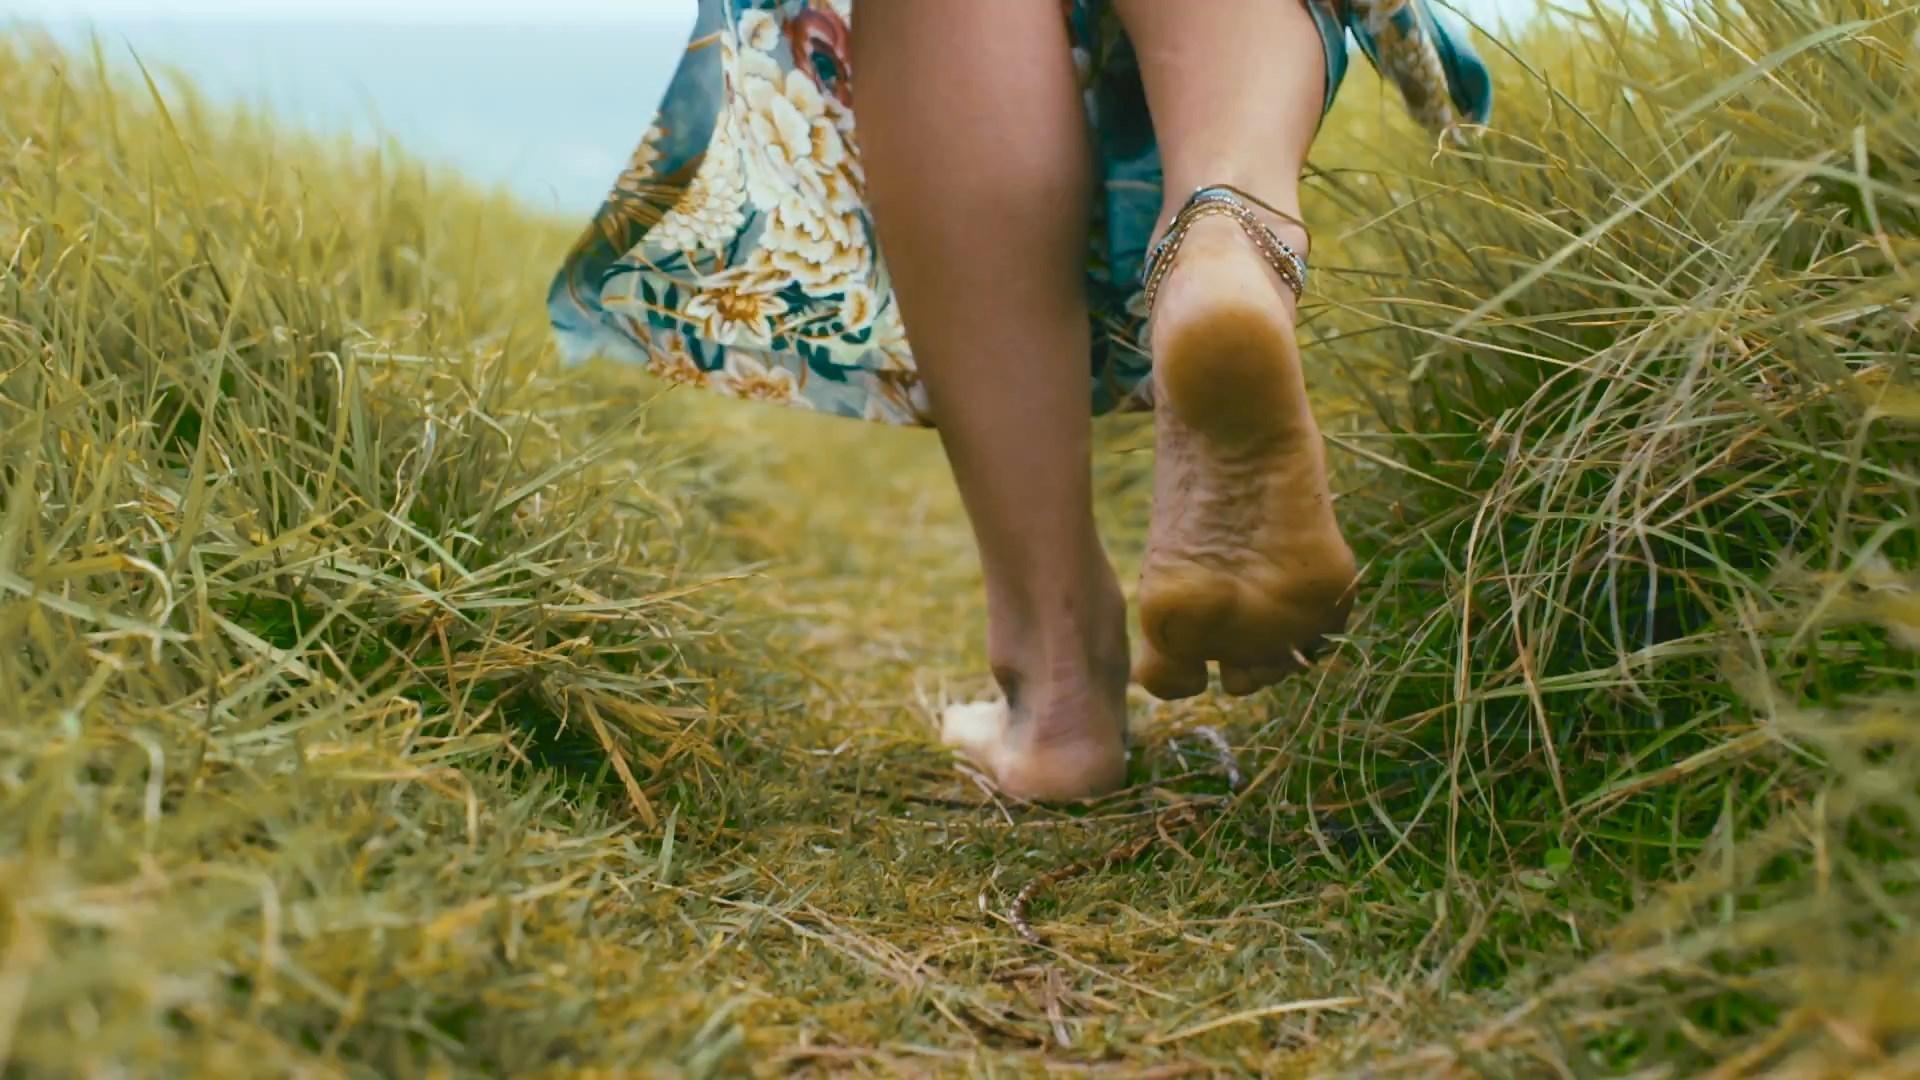 https://pics.wikifeet.com/Elsa-Pataky-Feet-2947625.jpg